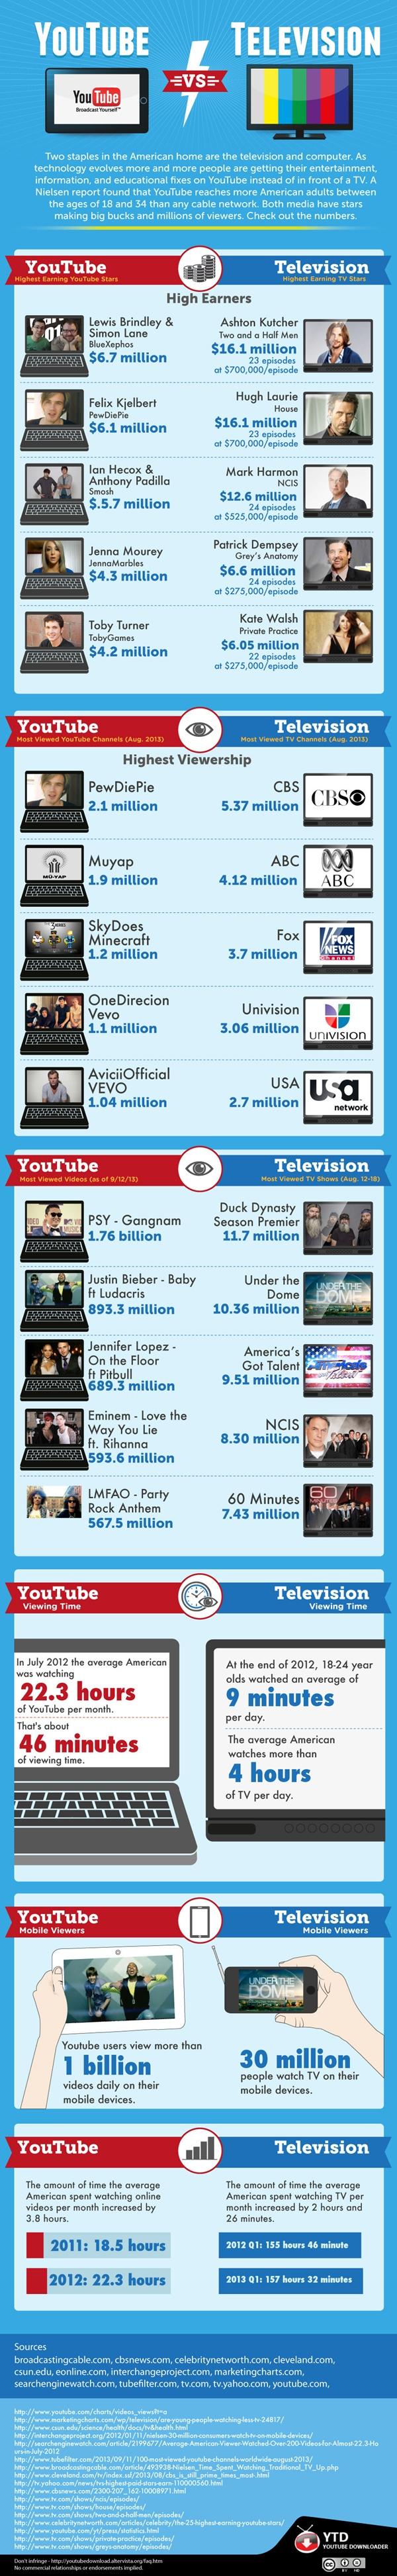 YouTube vs. Television